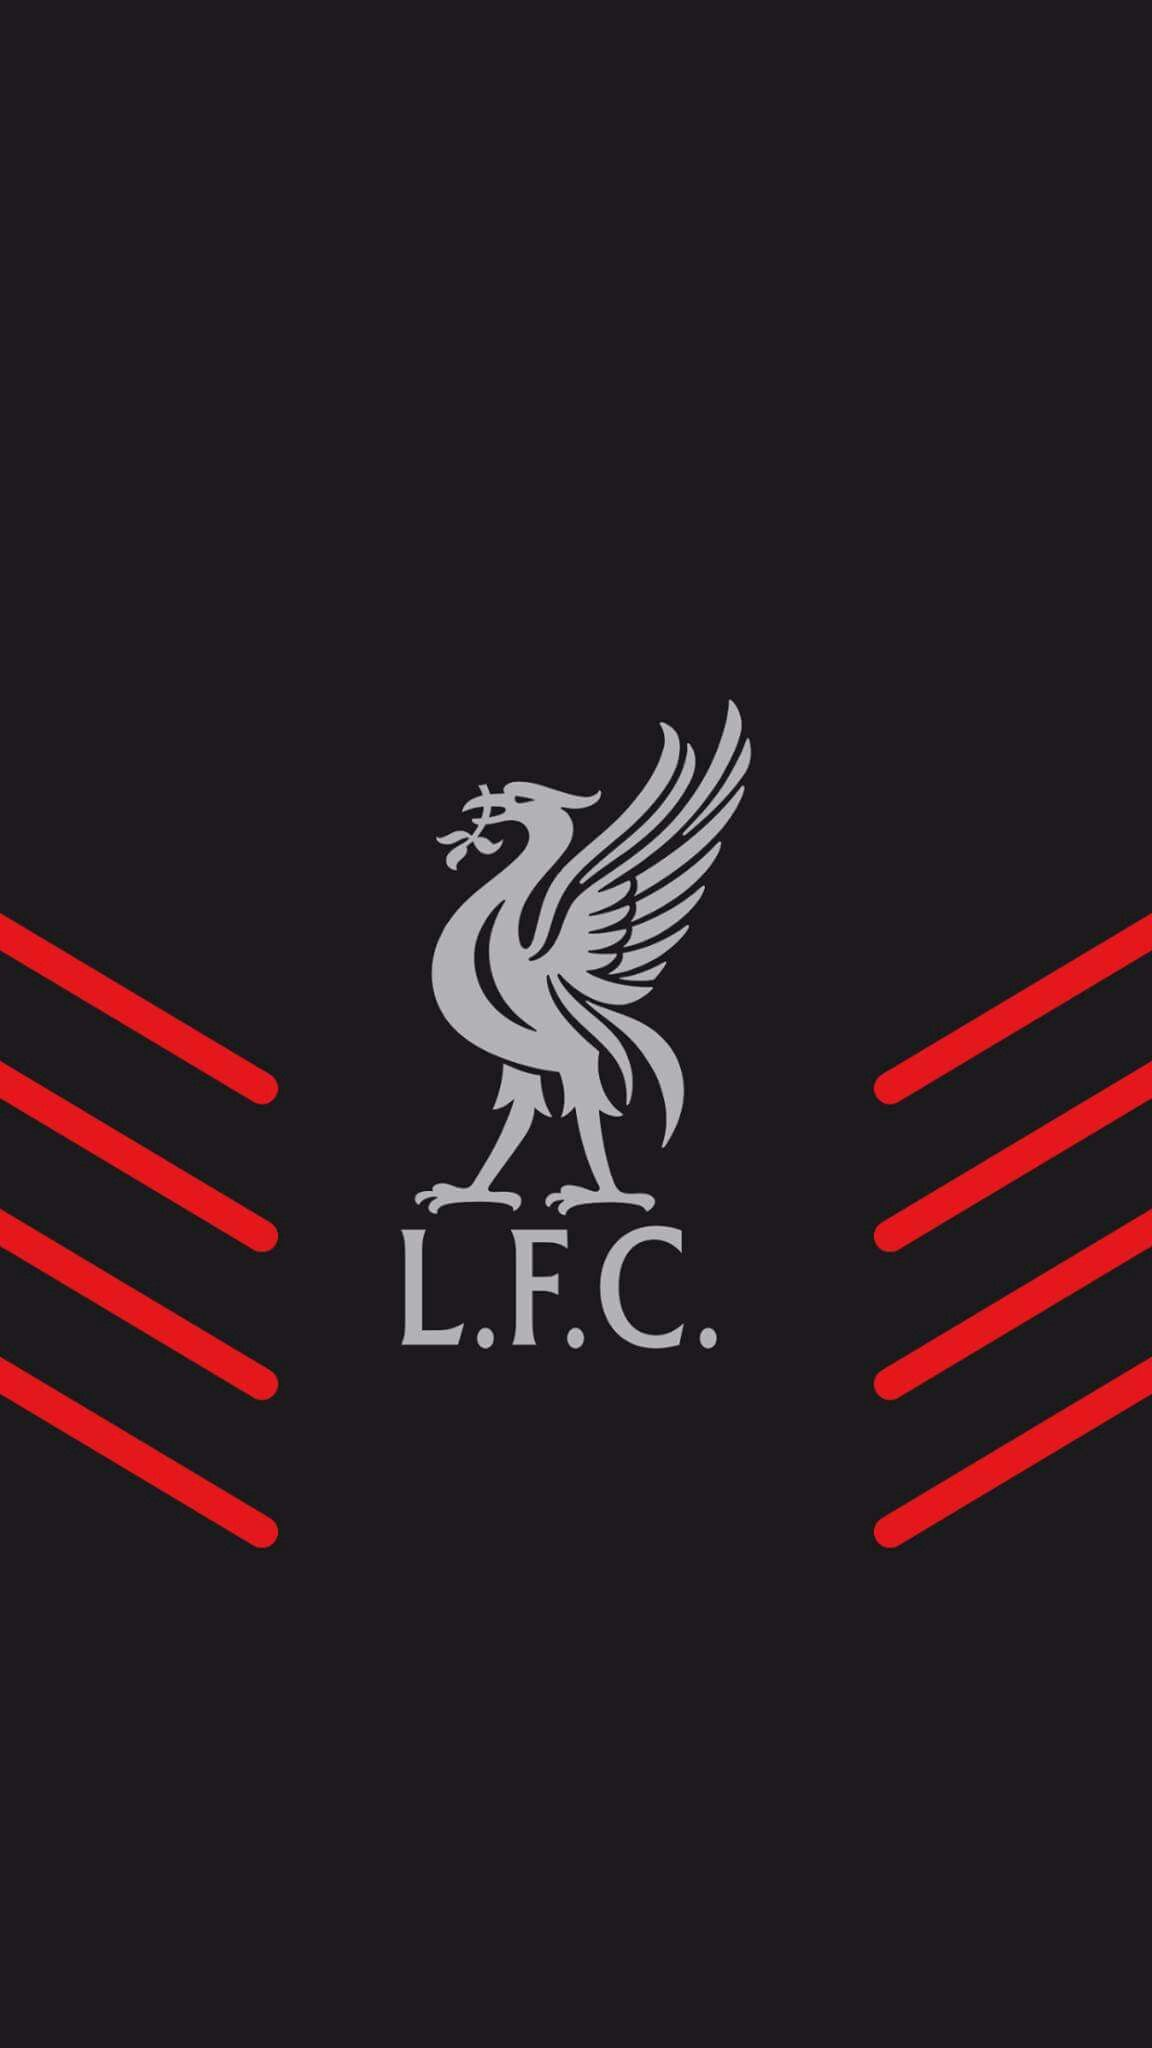 Liverpool fc lfc liverpool liverpool fc liverpool fc wallpaper liverpool wallpapers - Lfc pictures free ...